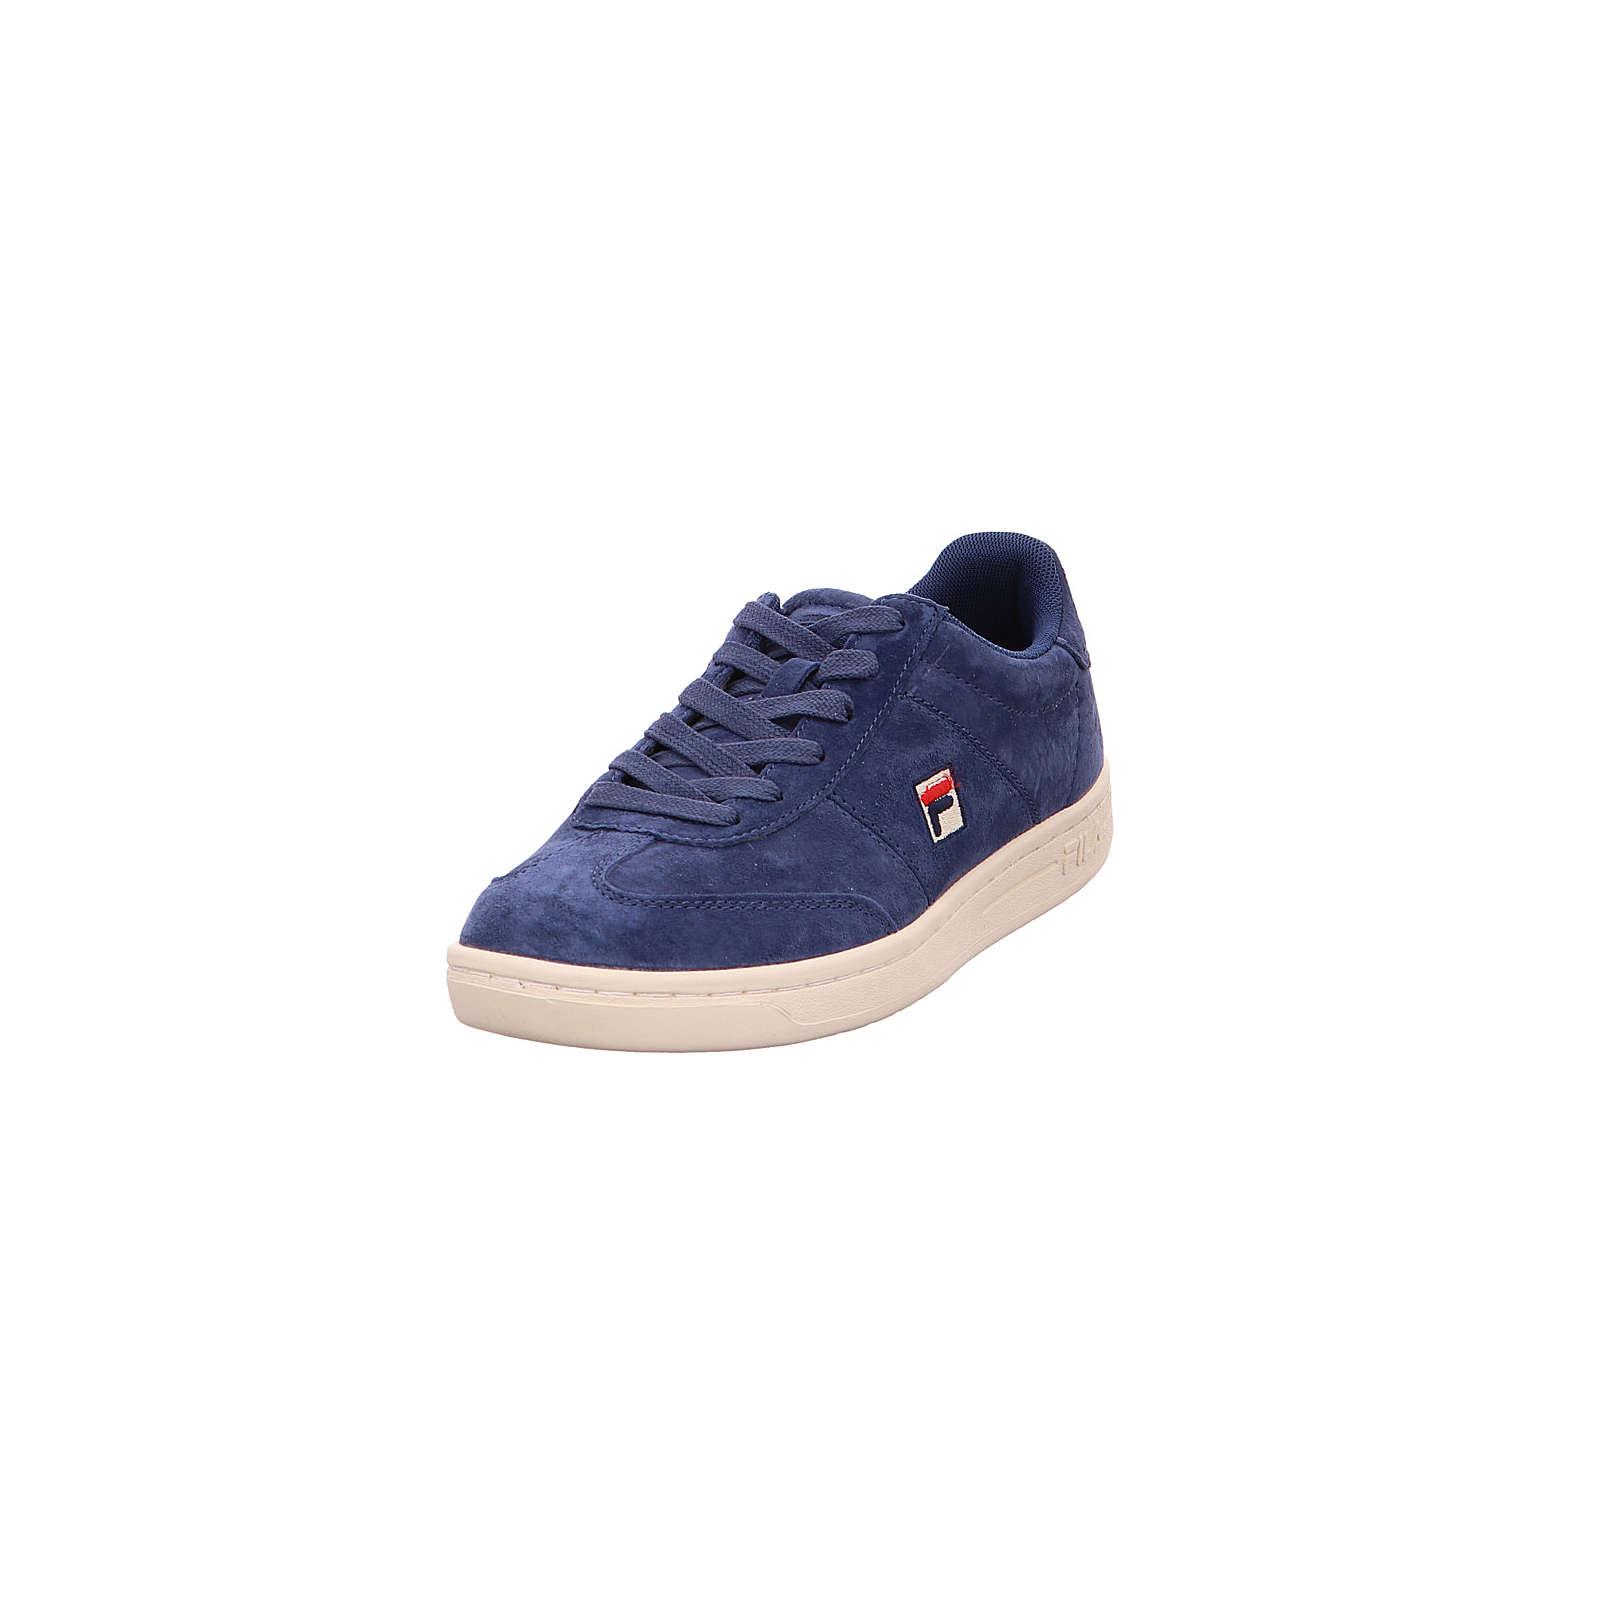 FILA Portland S Low Nubuk1010272-20Q Sneakers Low blau Herren Gr. 46